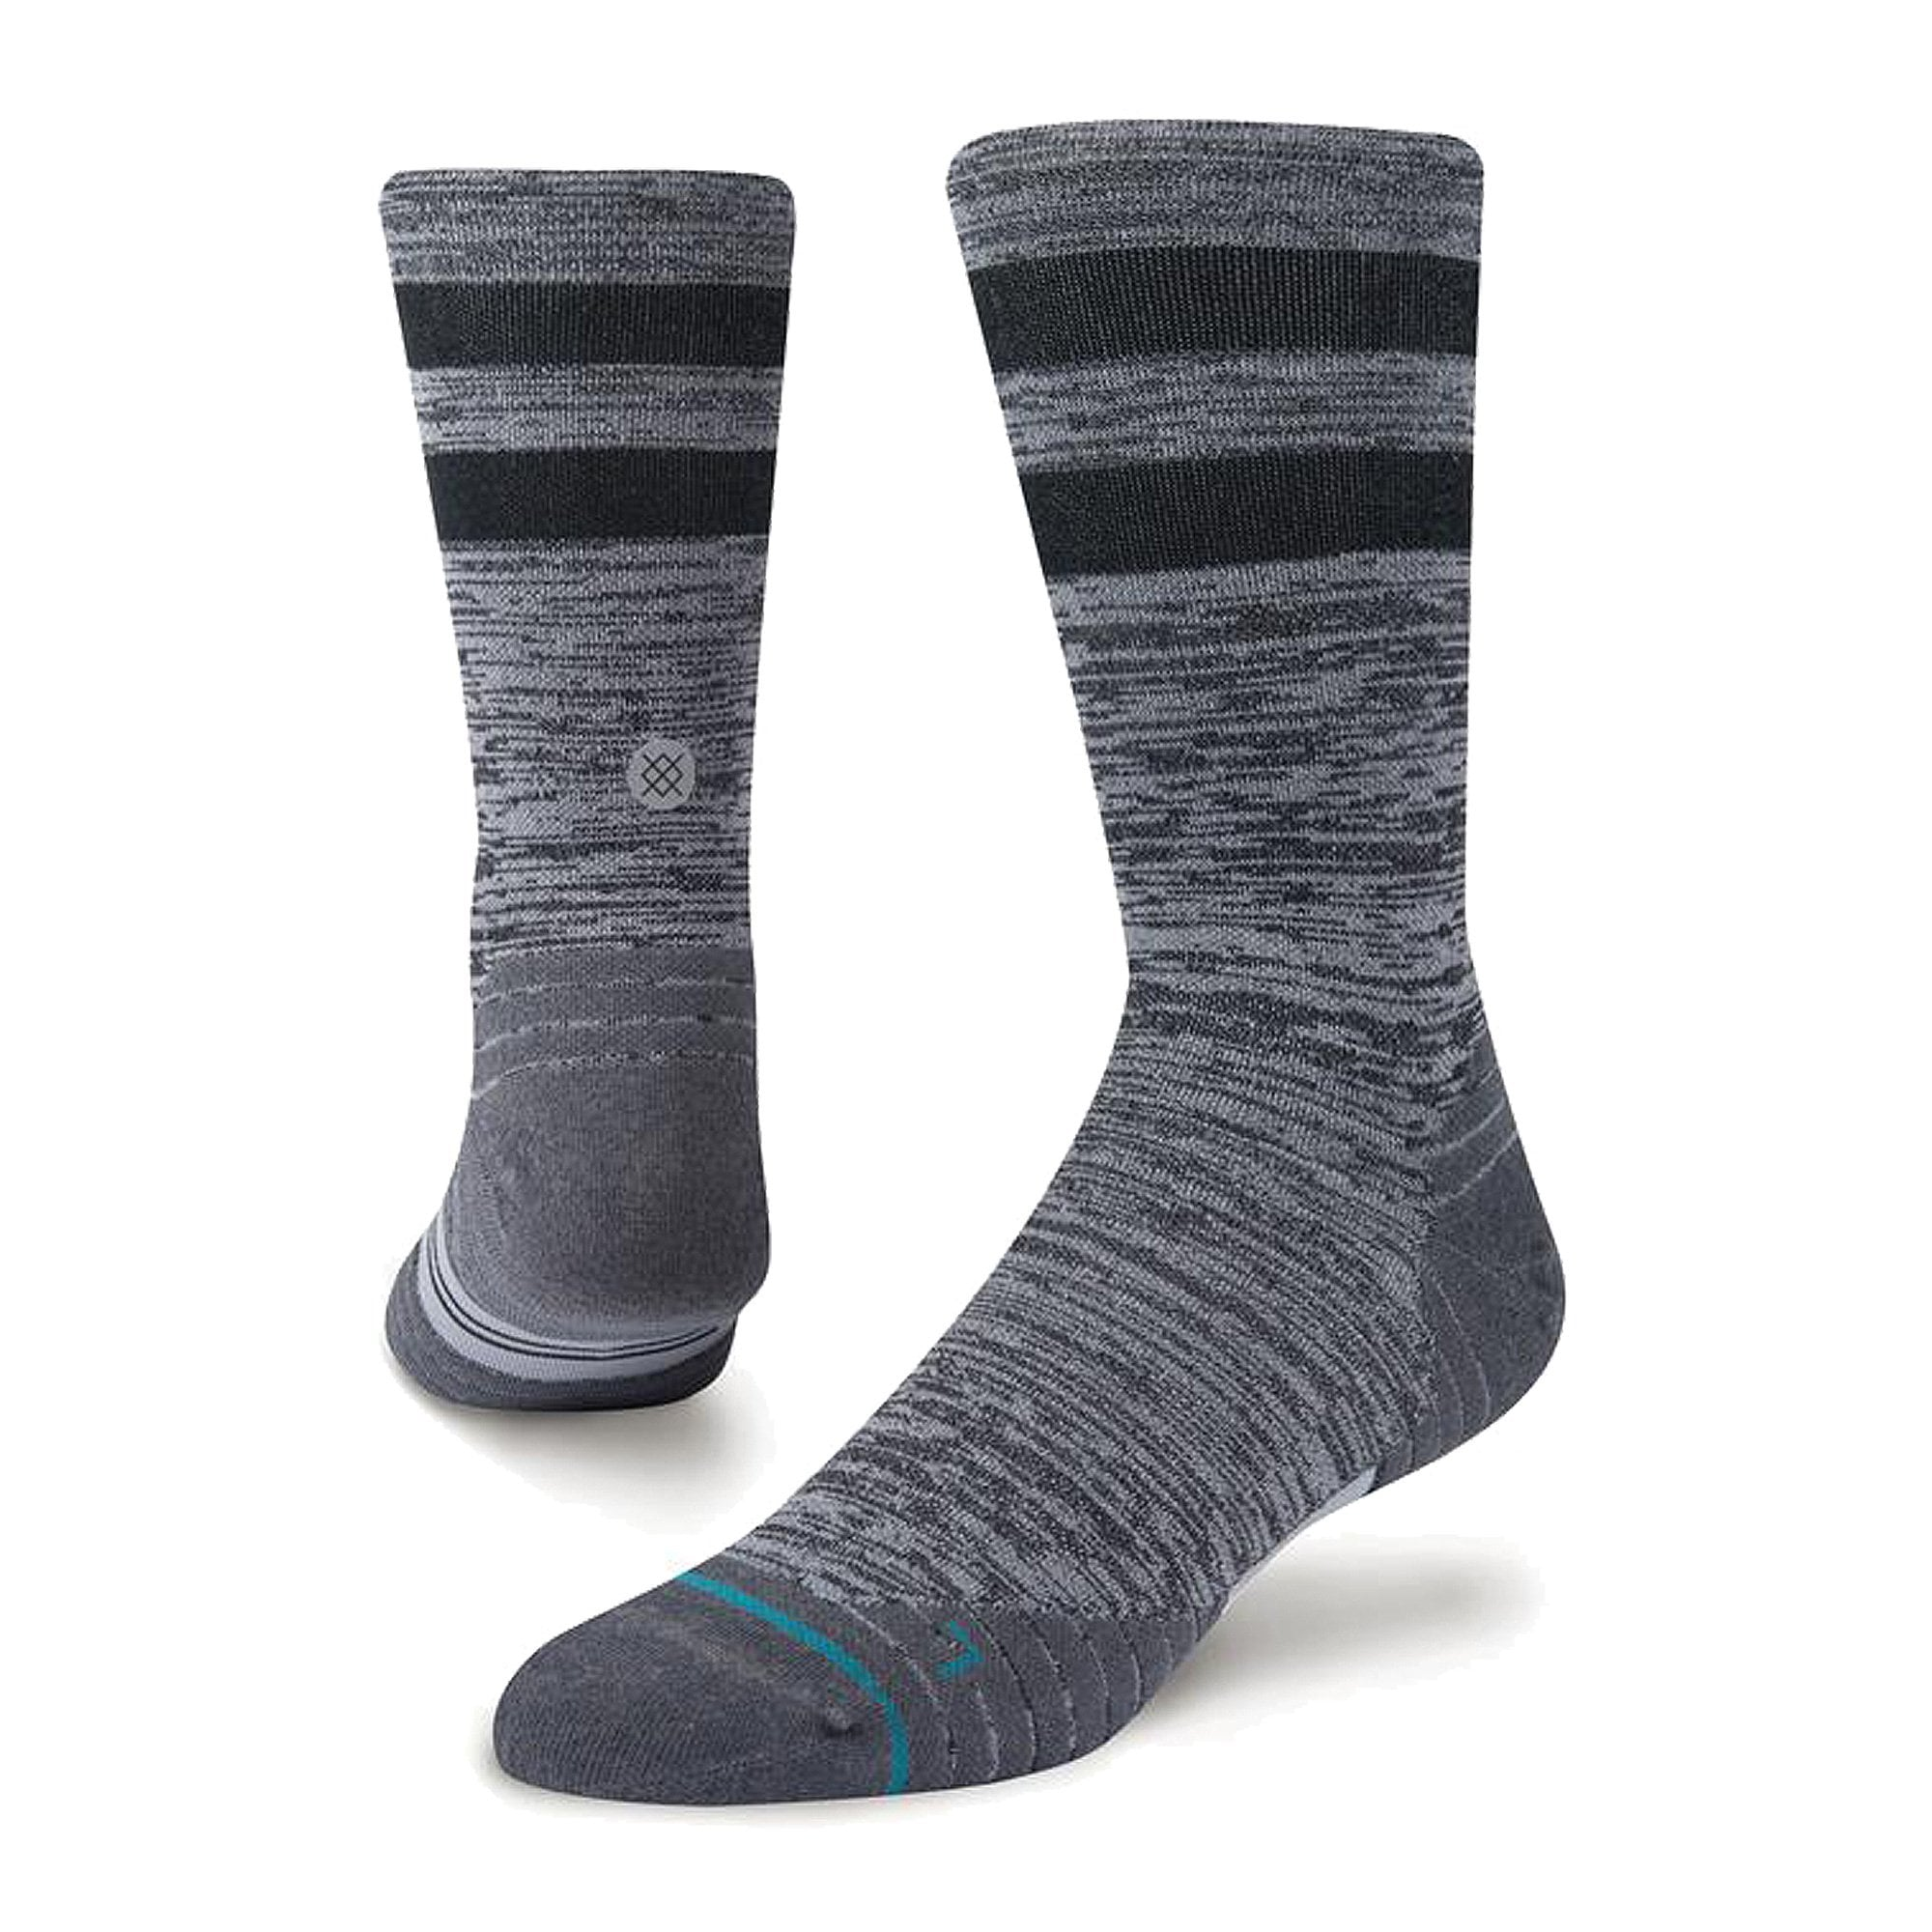 13-16 New STANCE Men/'s Uncommon Solids Tab Running Sock XL